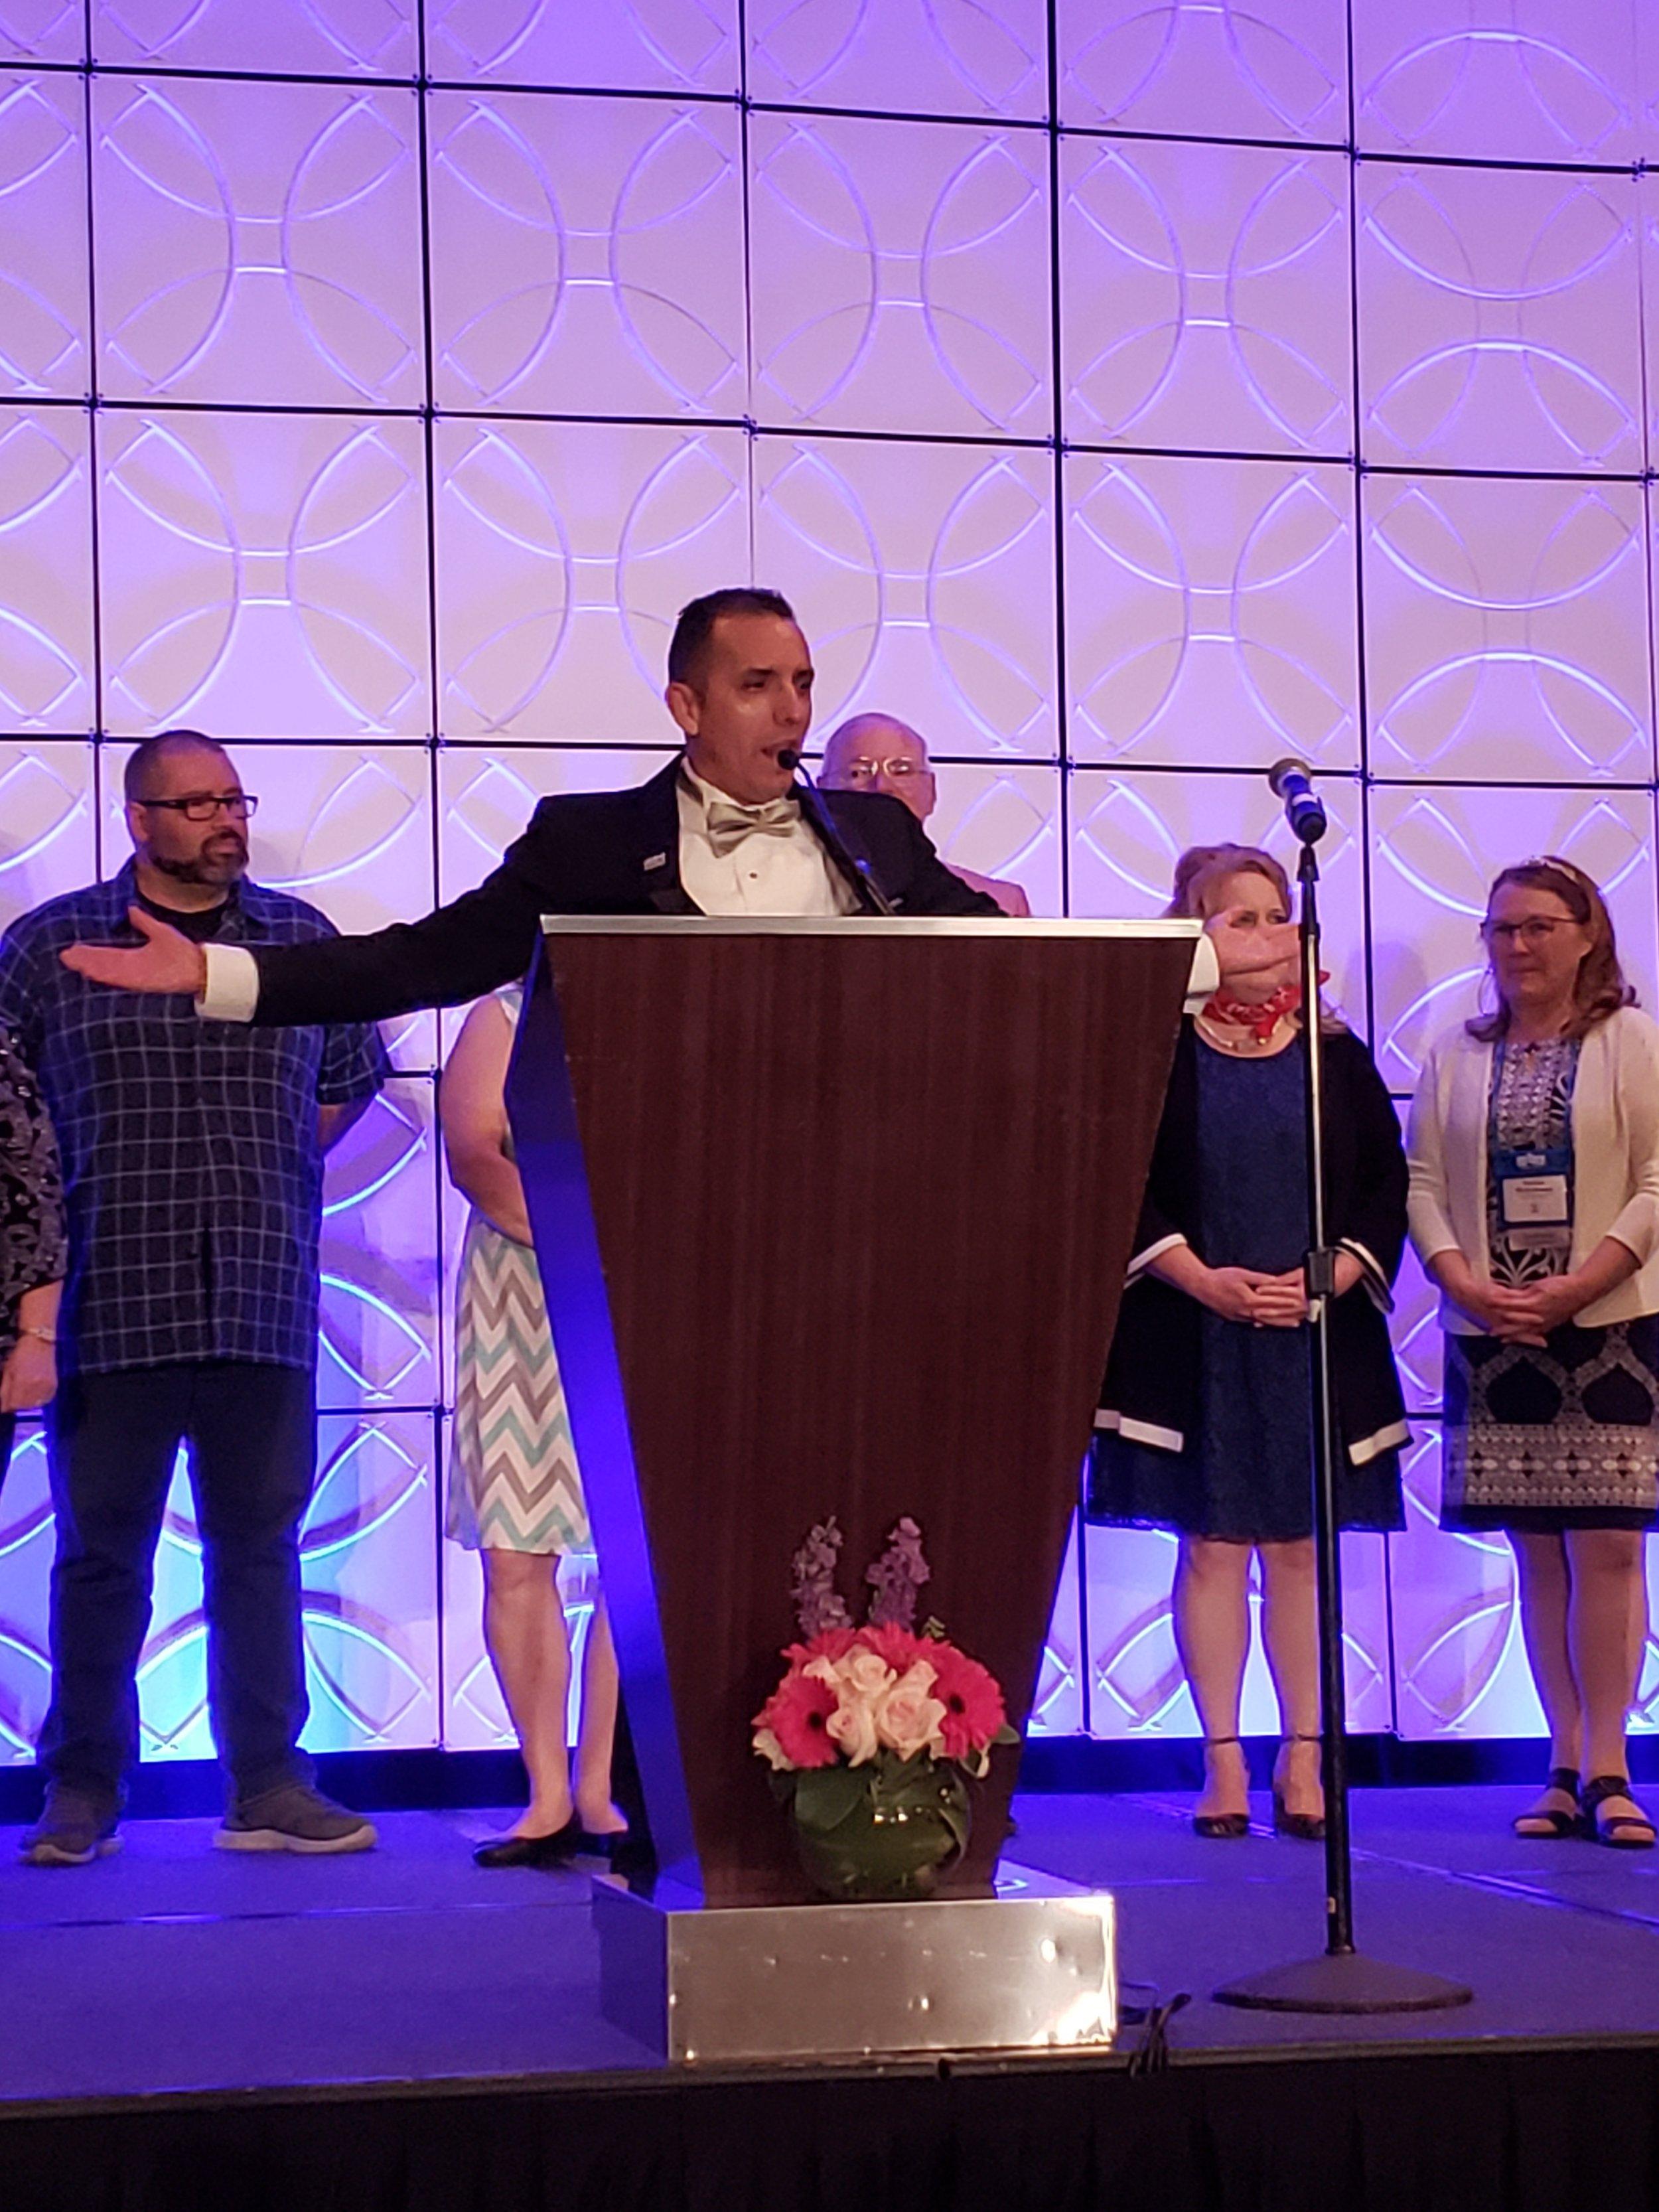 CCAE-State-Conference-San_Diego-2019-SC (7).jpg